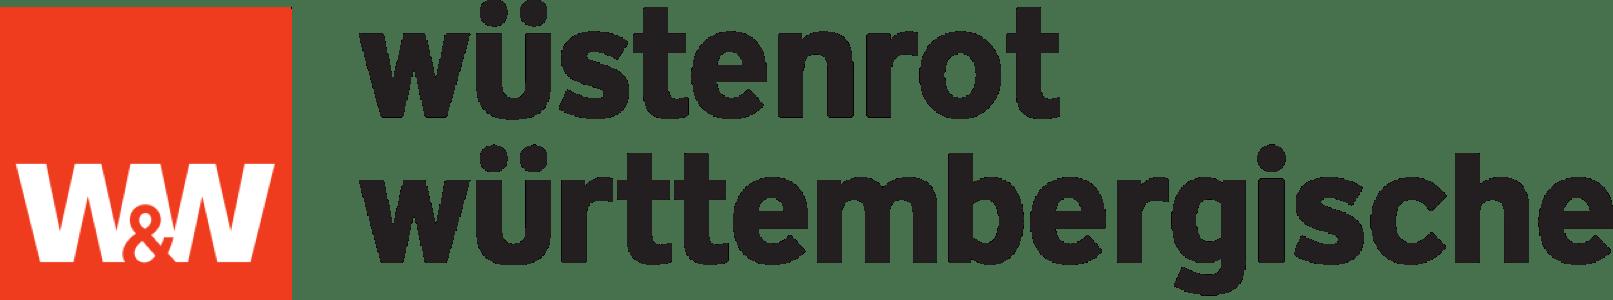 pflegeversicherung-logo-wuerttembergische